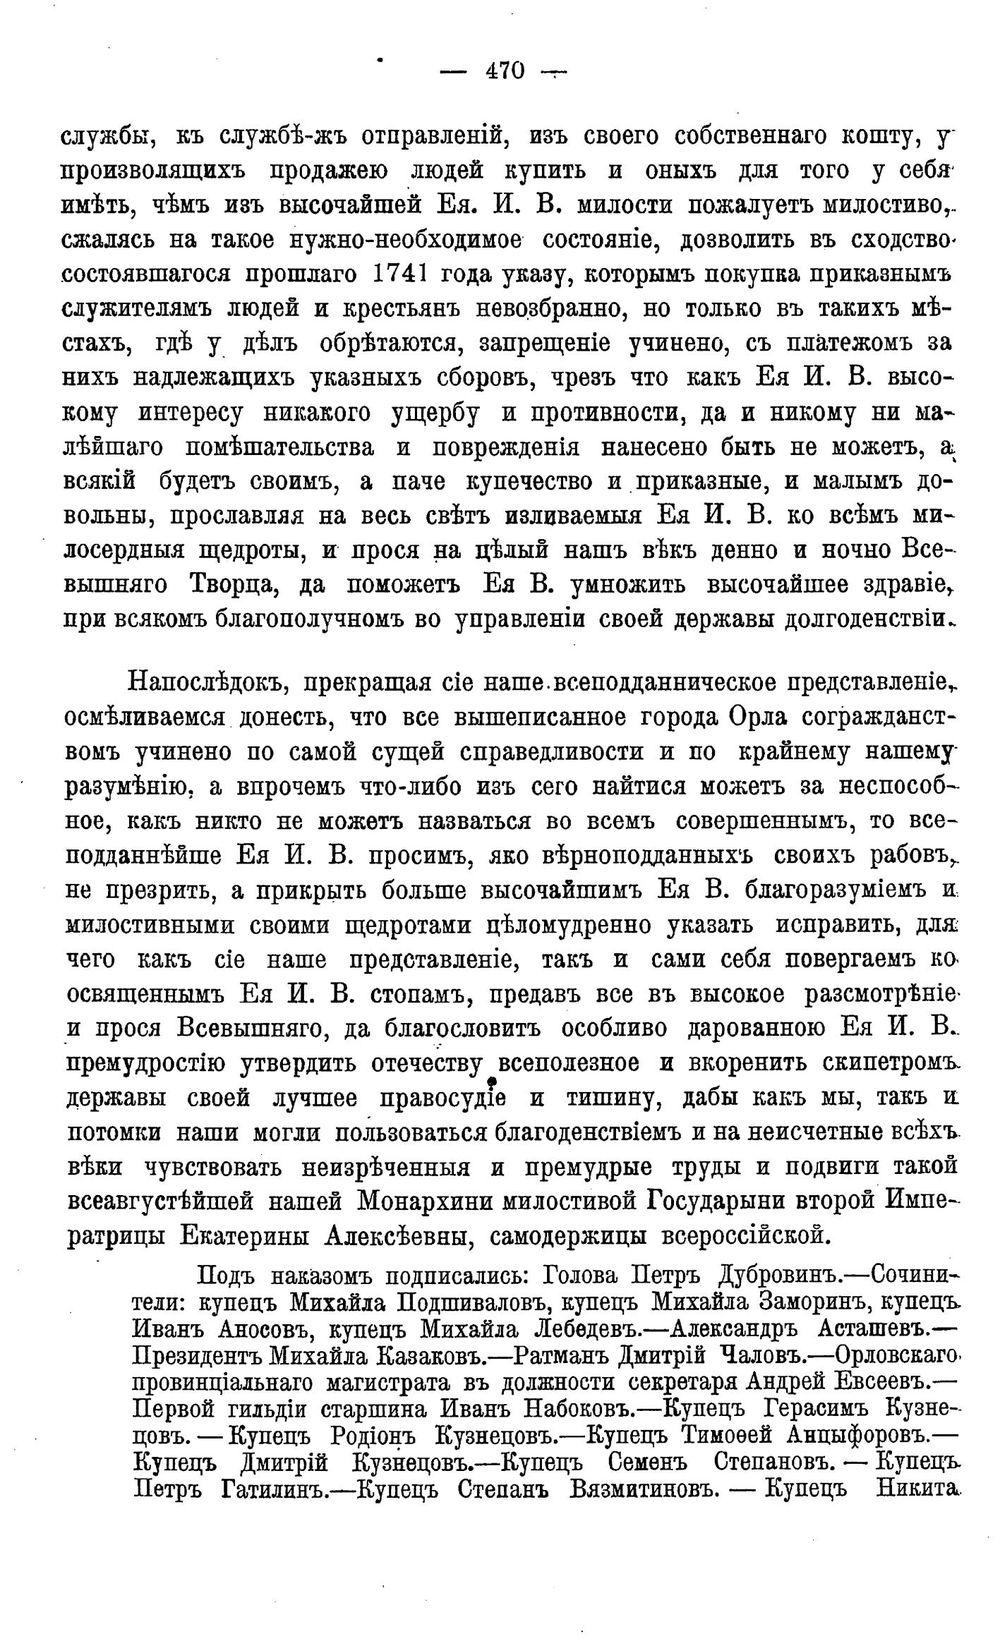 http://i1.imageban.ru/out/2017/01/25/9e8d1997e49649d38cd51ccbc2c97708.jpg